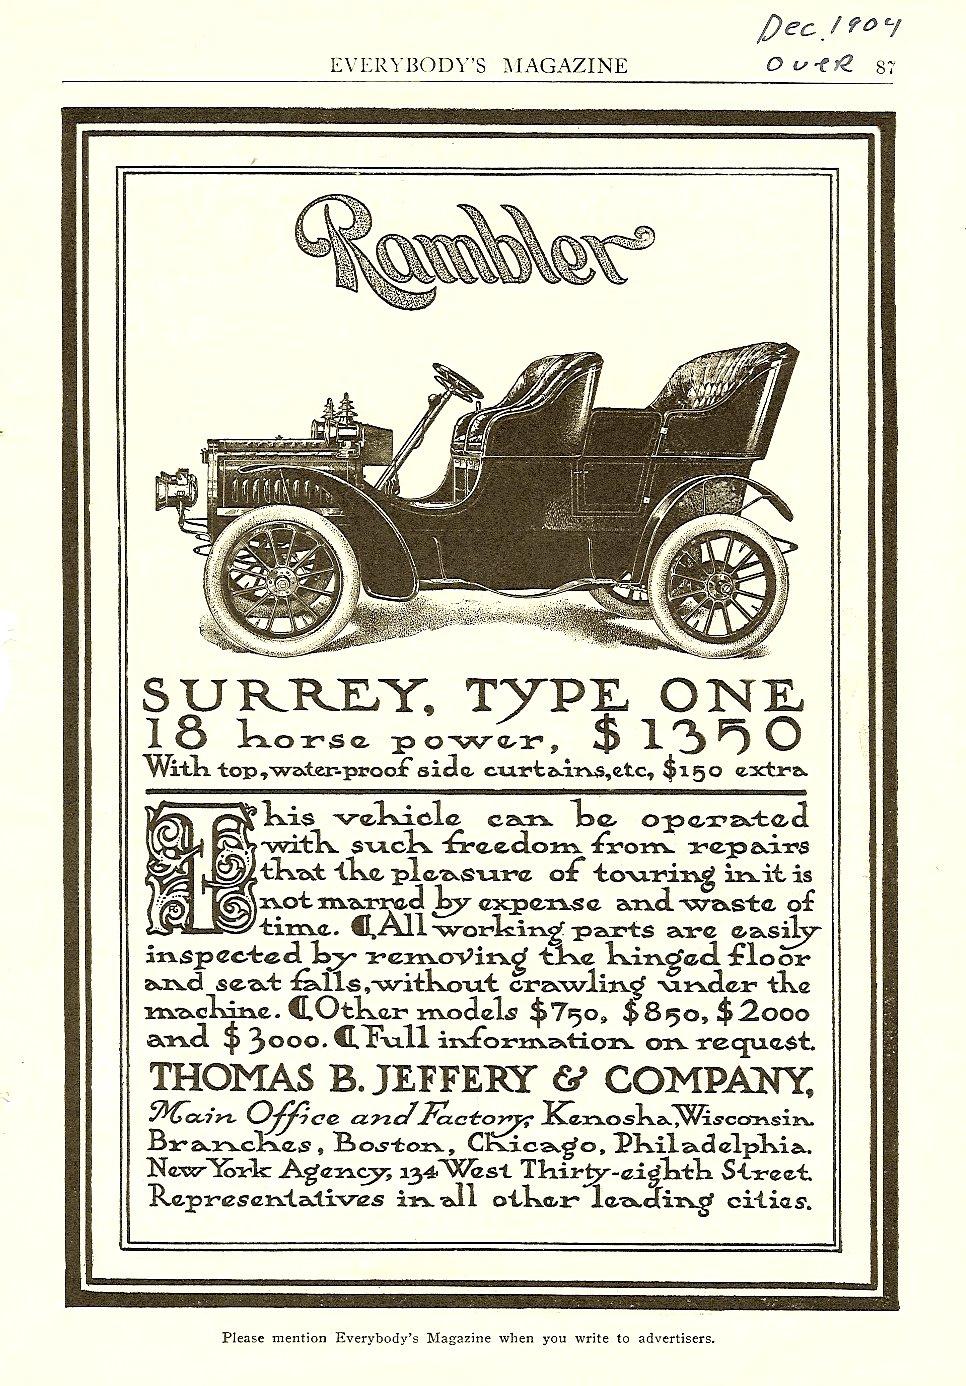 1904 12 Rambler Surrey, Type One EVERYBODY'S MAGAZINE Dec. 1904 6.75″x9.75″ page 87